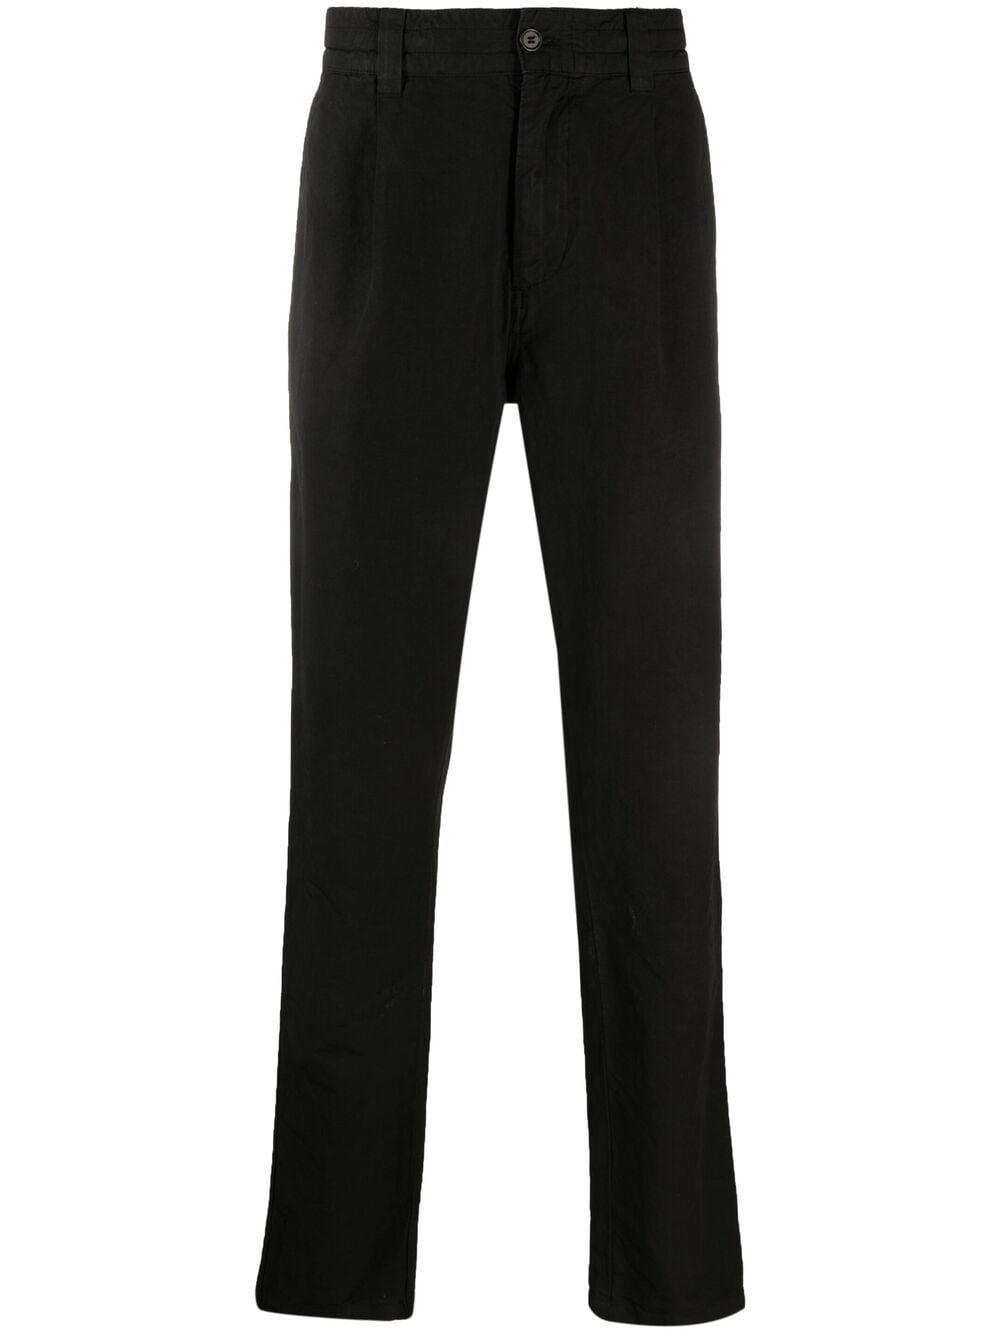 Aspesi pantaloni a gamba dritta uomo nero ASPESI | Pantaloni | CP30 G43485241